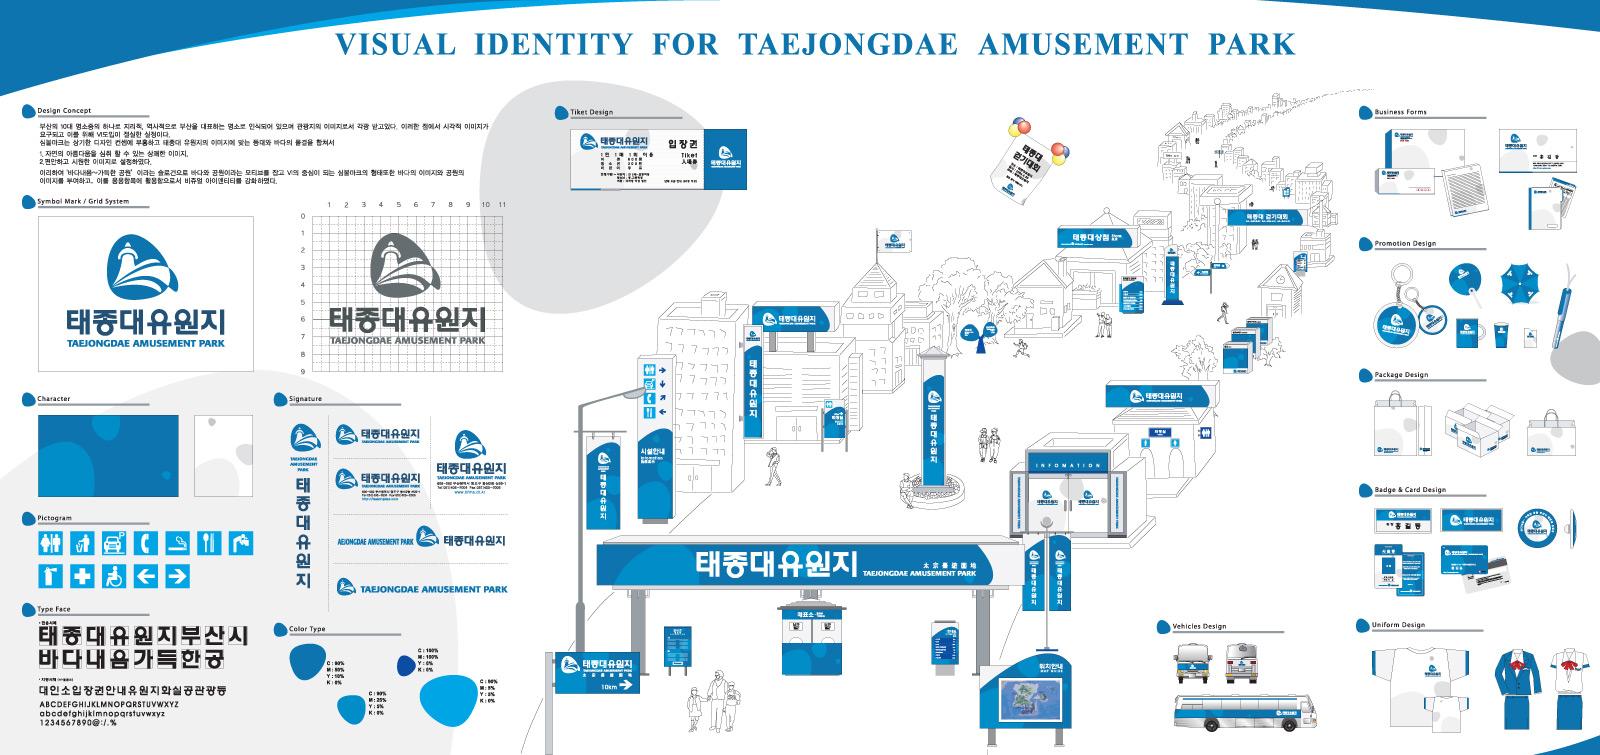 taejongdae-amusement-park-001.jpg